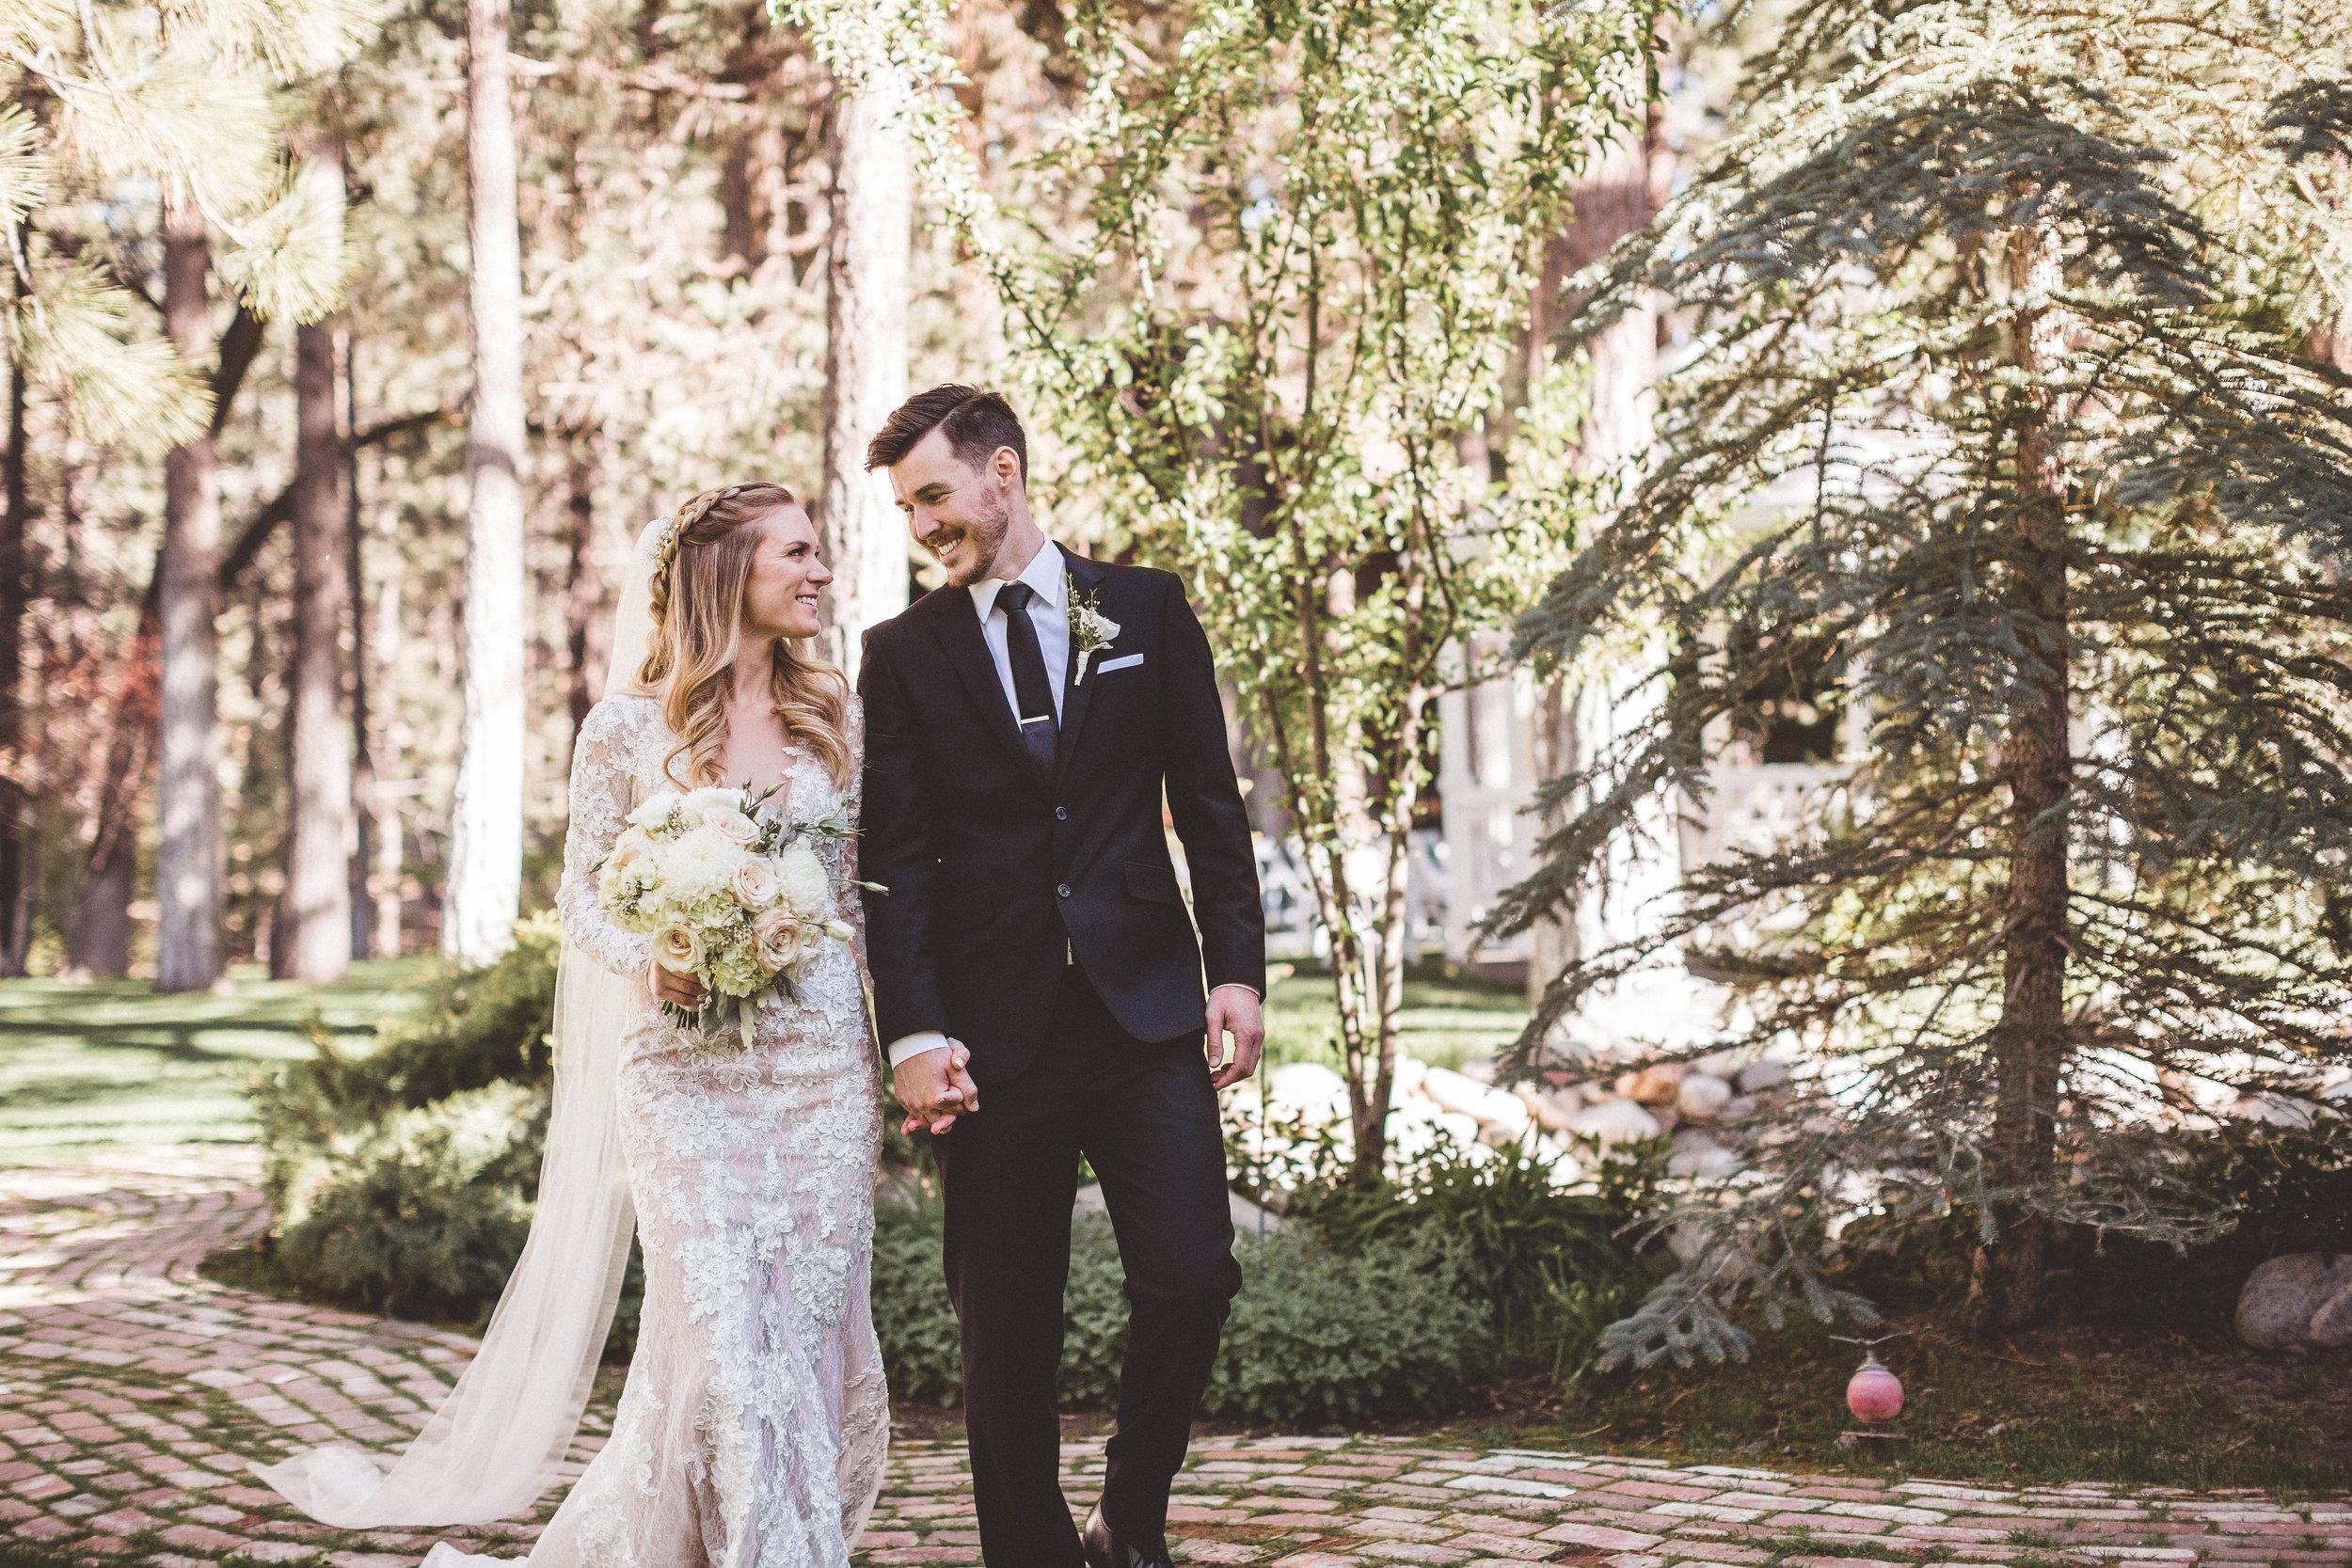 jill-and-alexs-intimates-big-bear-wedding29.jpg